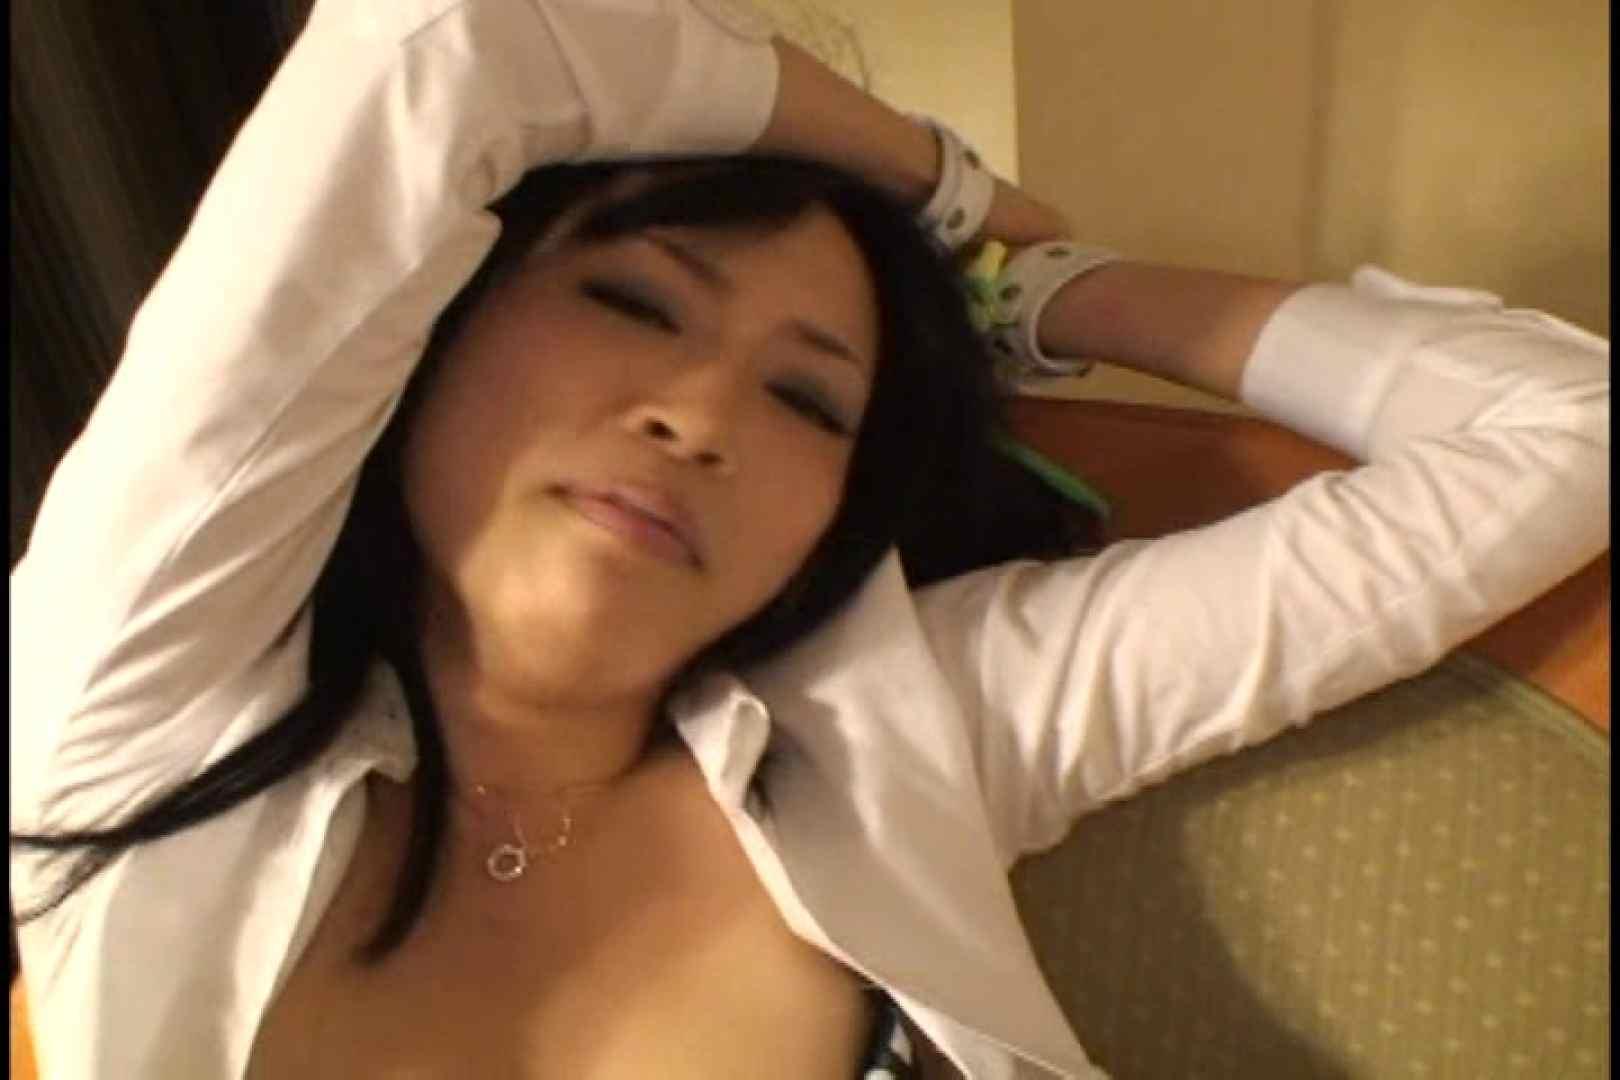 JDハンター全国ツアー vol.033 後編 女子大生のエロ動画 | 0  107PIX 93